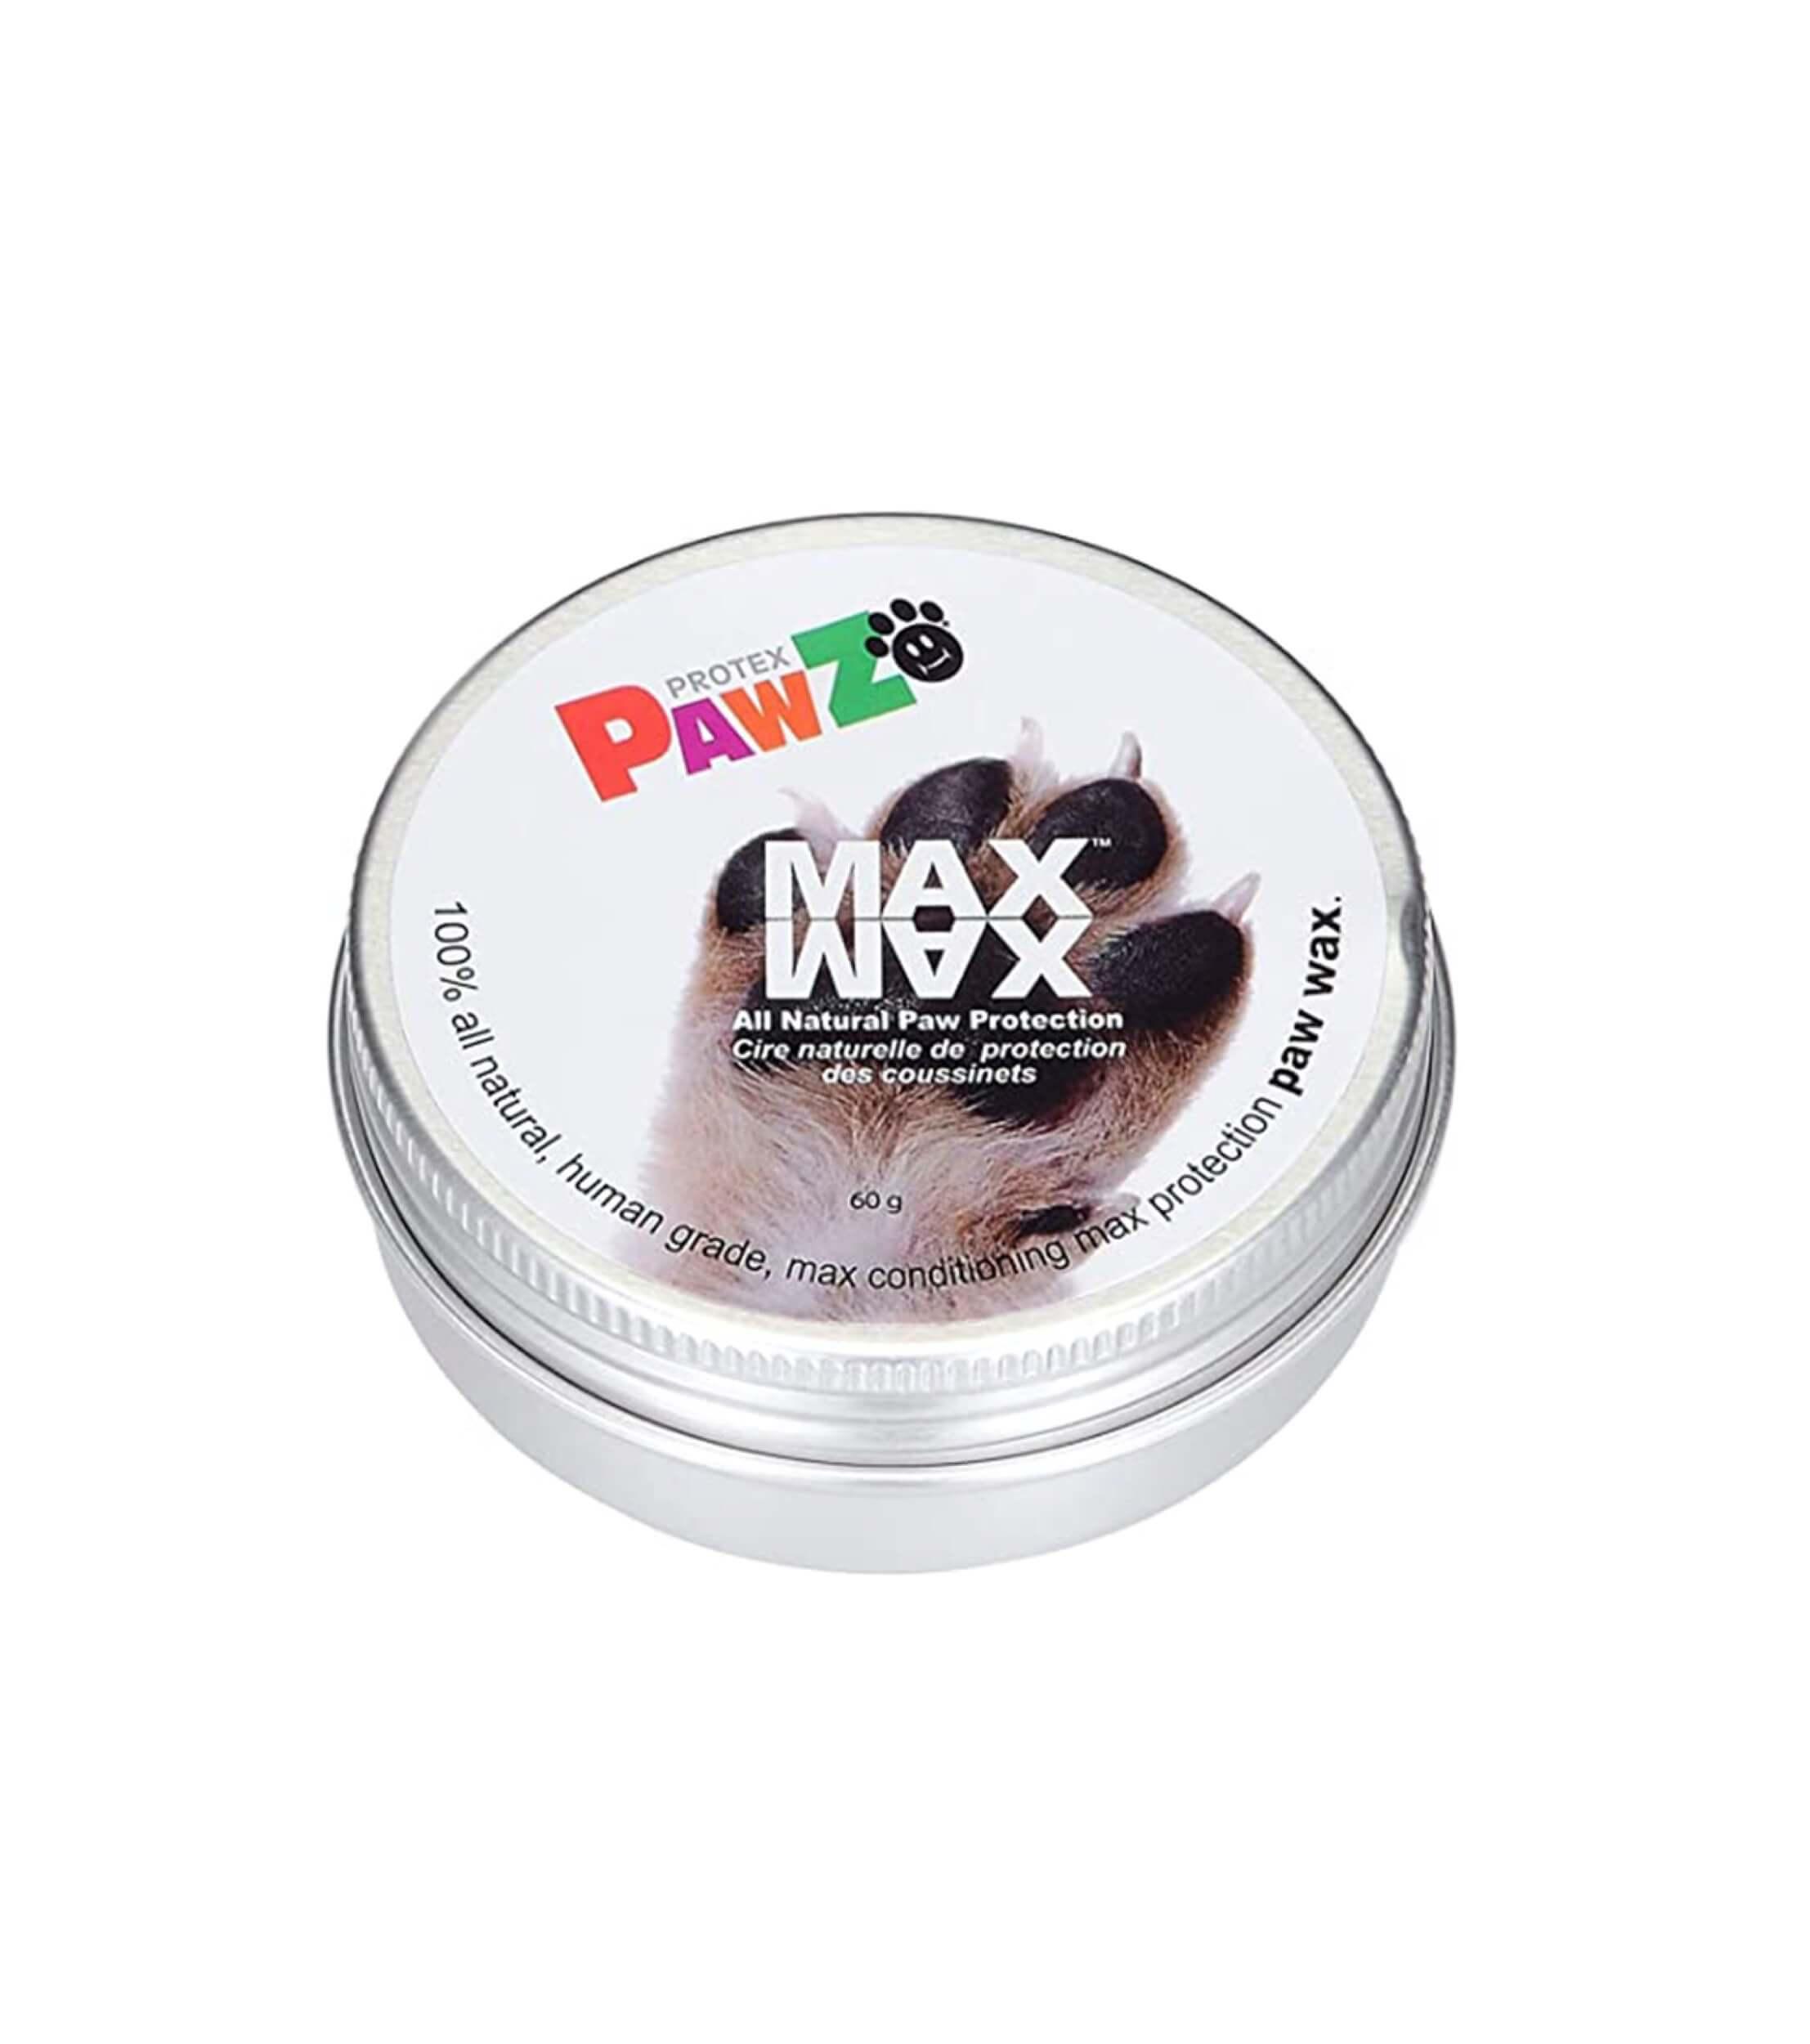 Crema Almohadillas Pawz Max